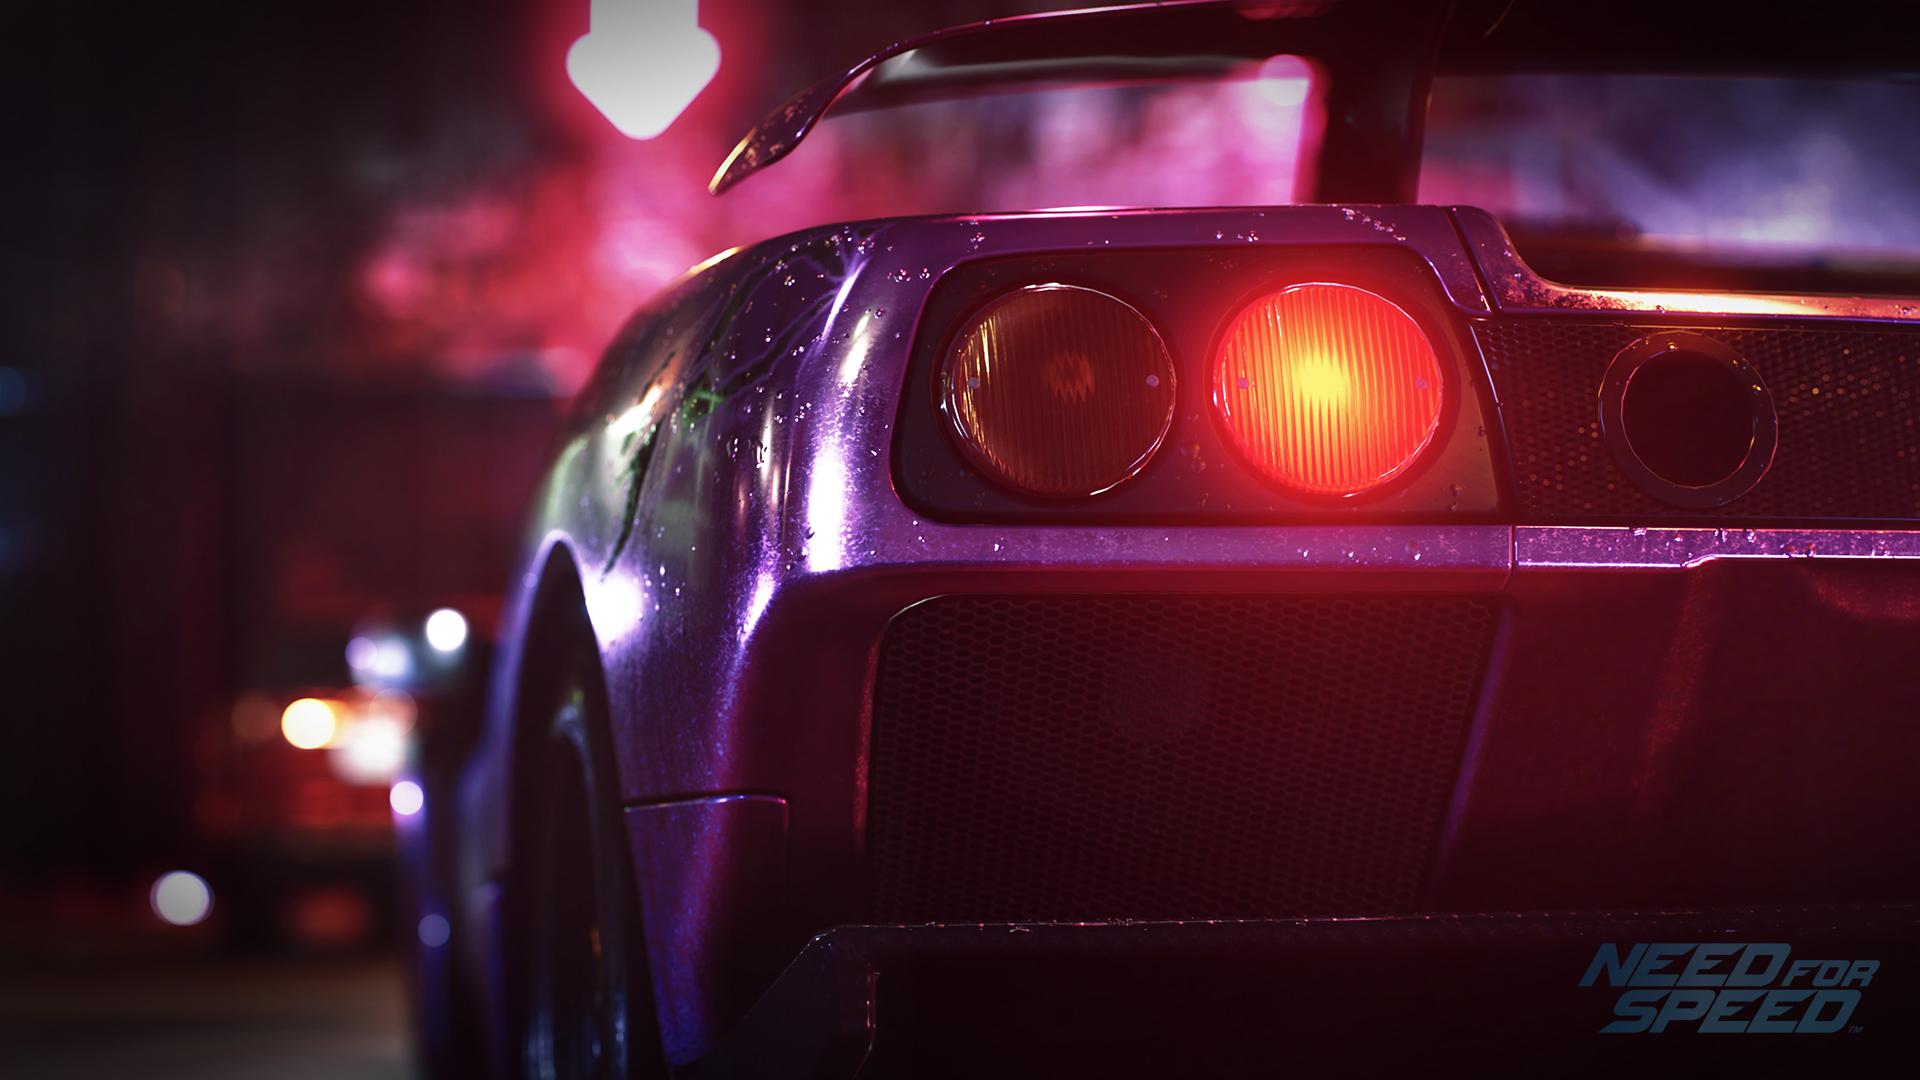 Krásné obrázky z Need for Speed 114115